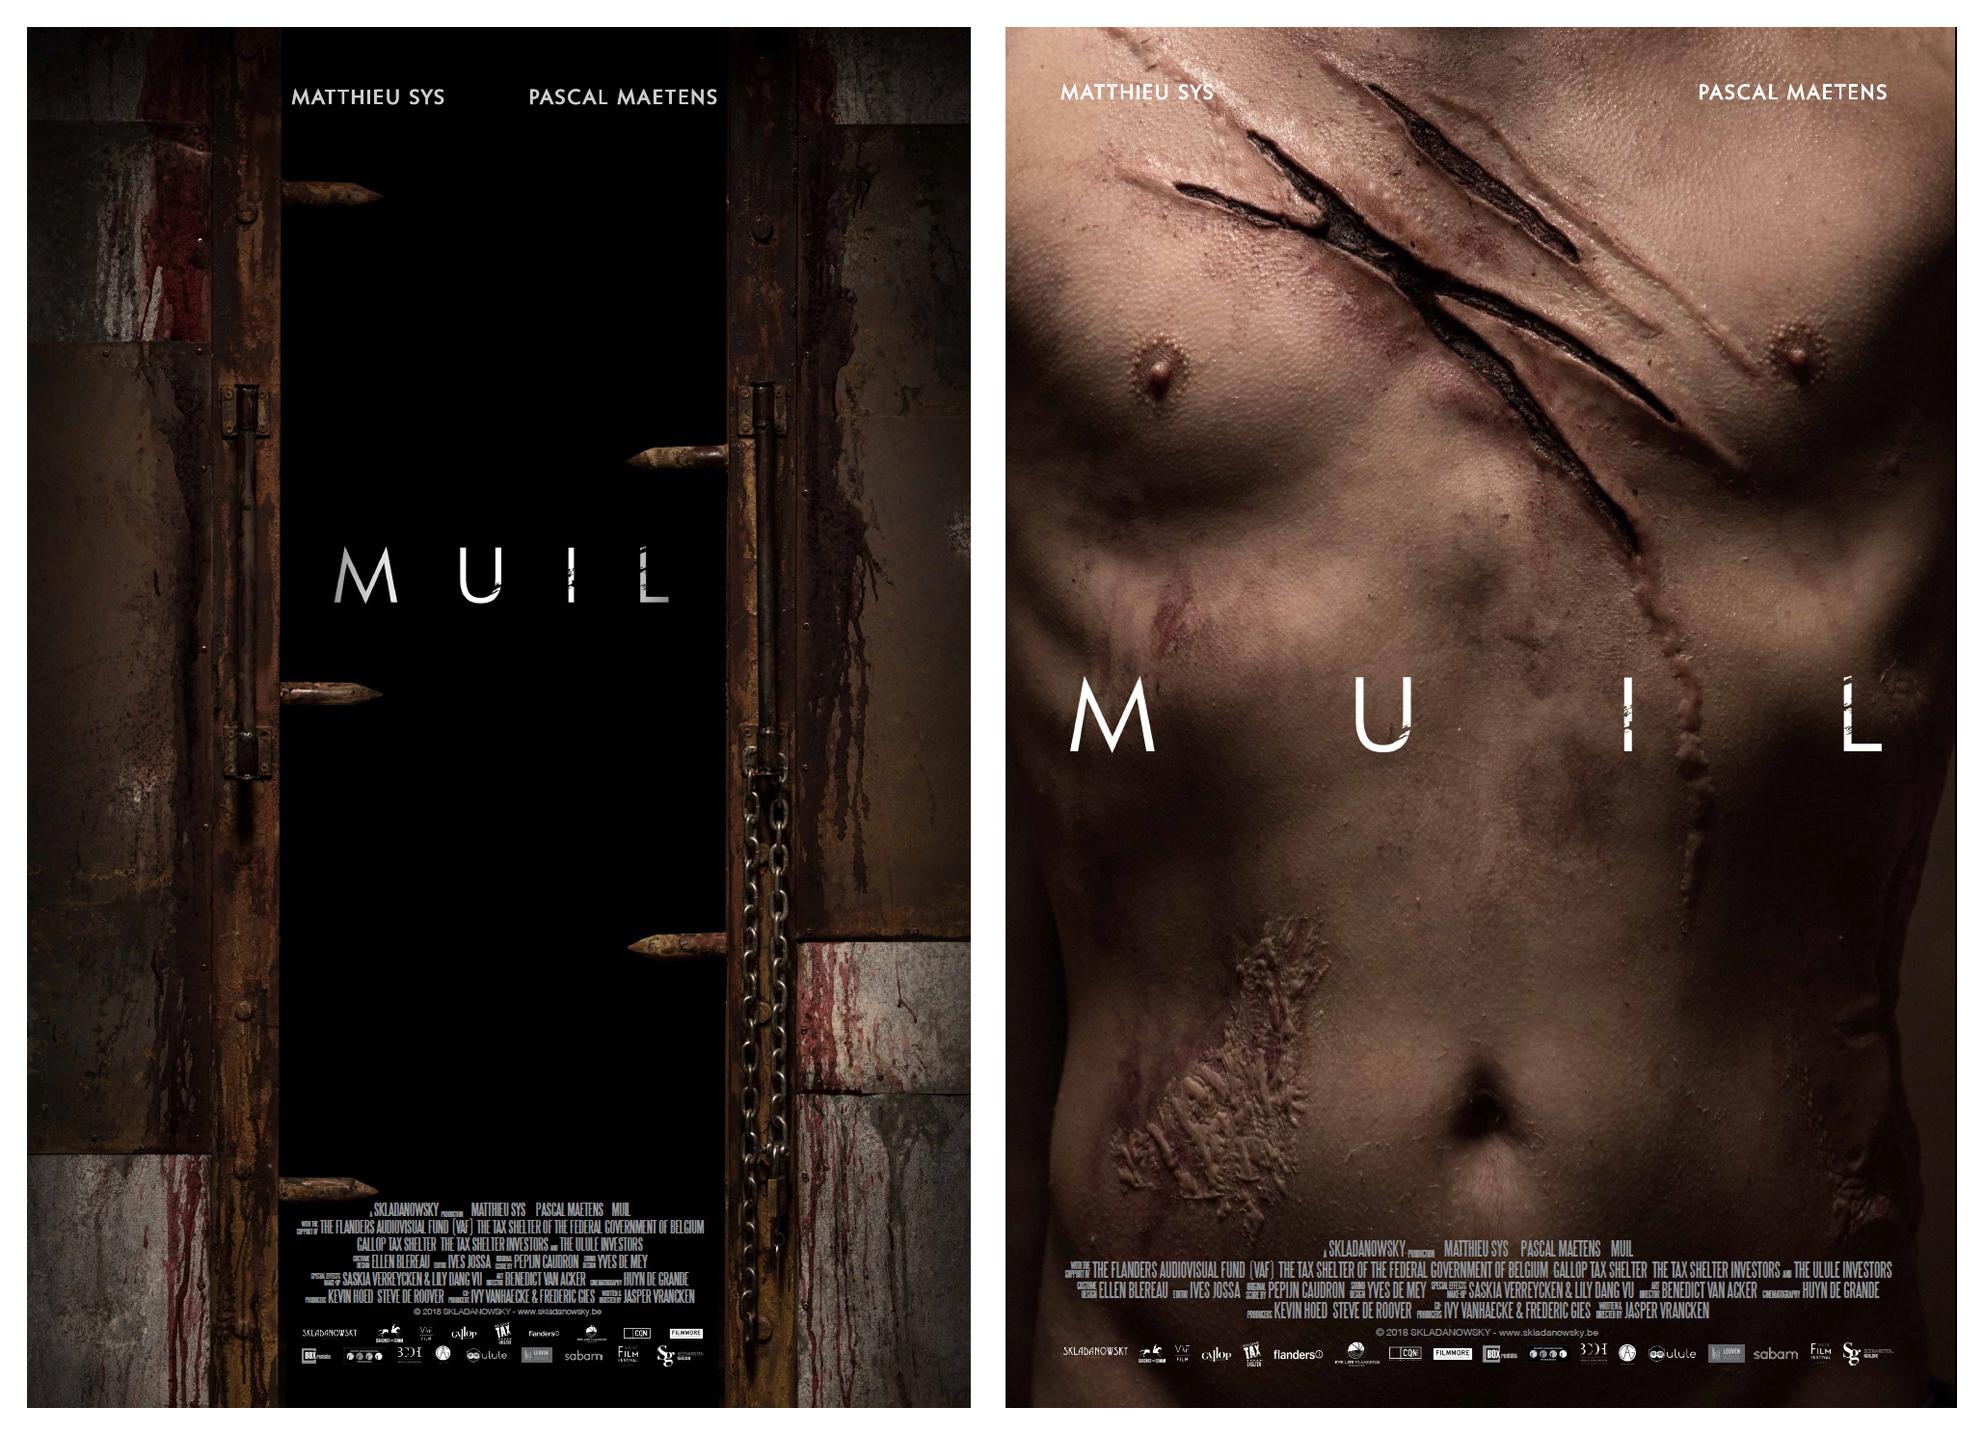 posters_MUIL copy.jpg